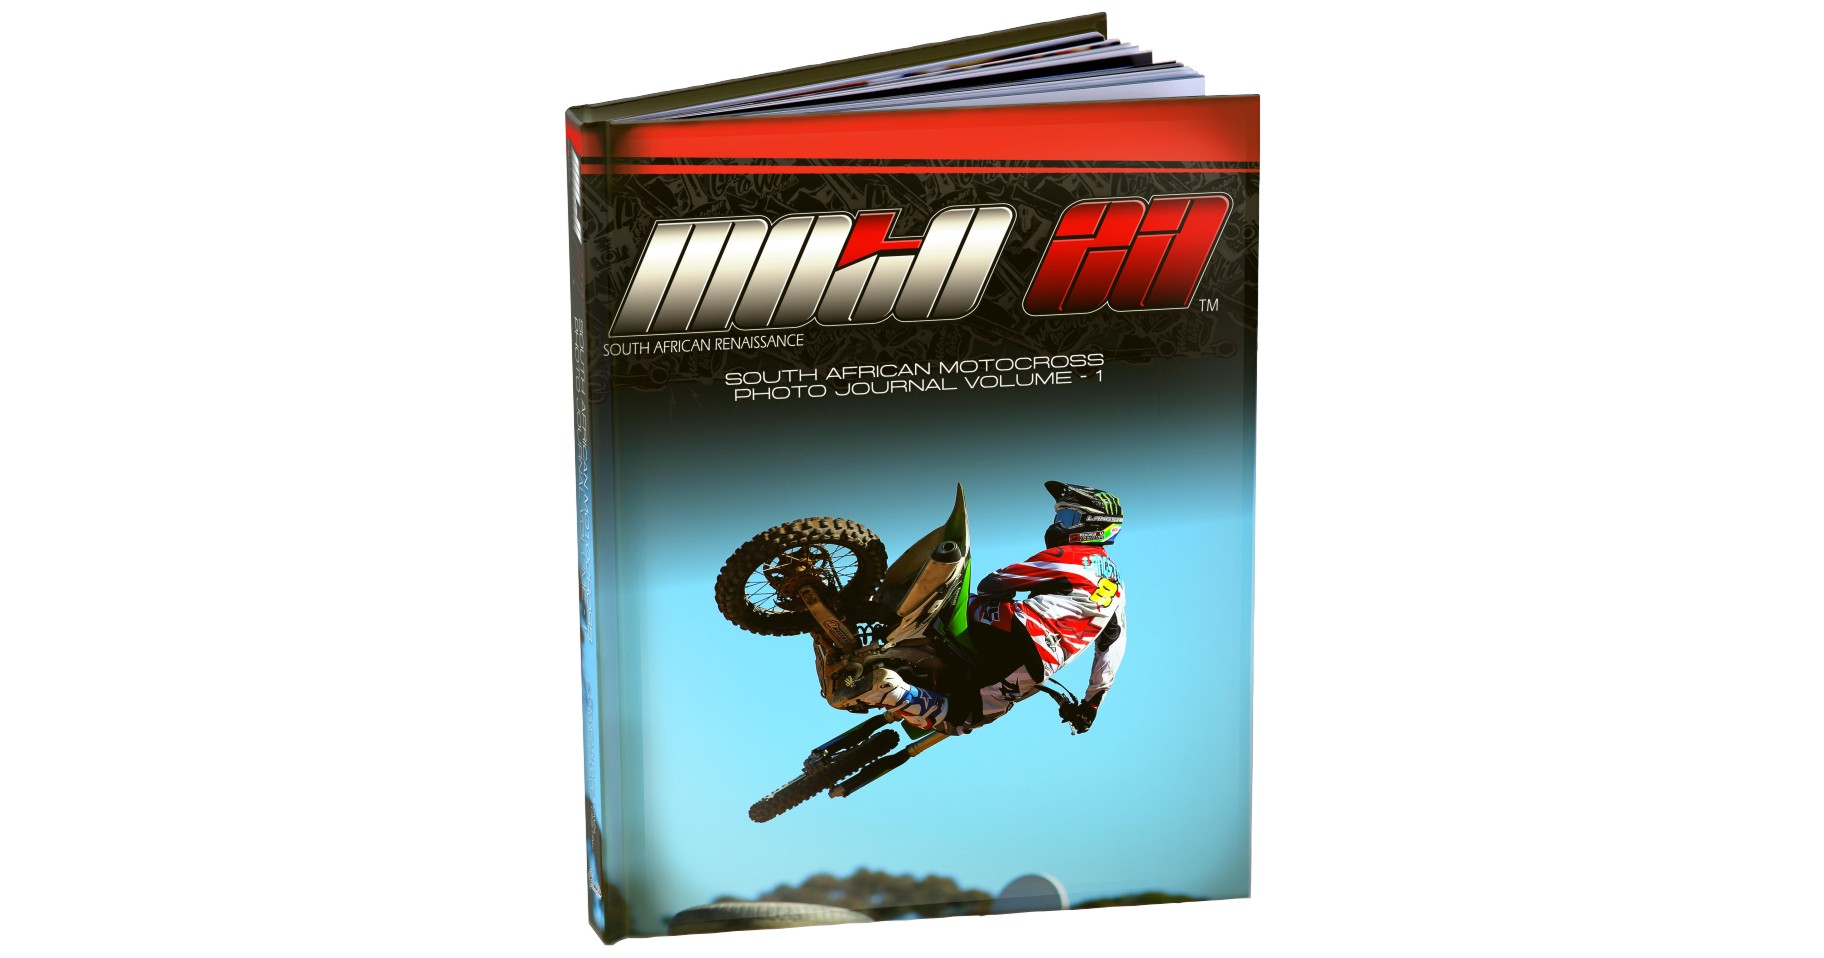 Moto ZA – South African Motocross Photo Journal Volume 1